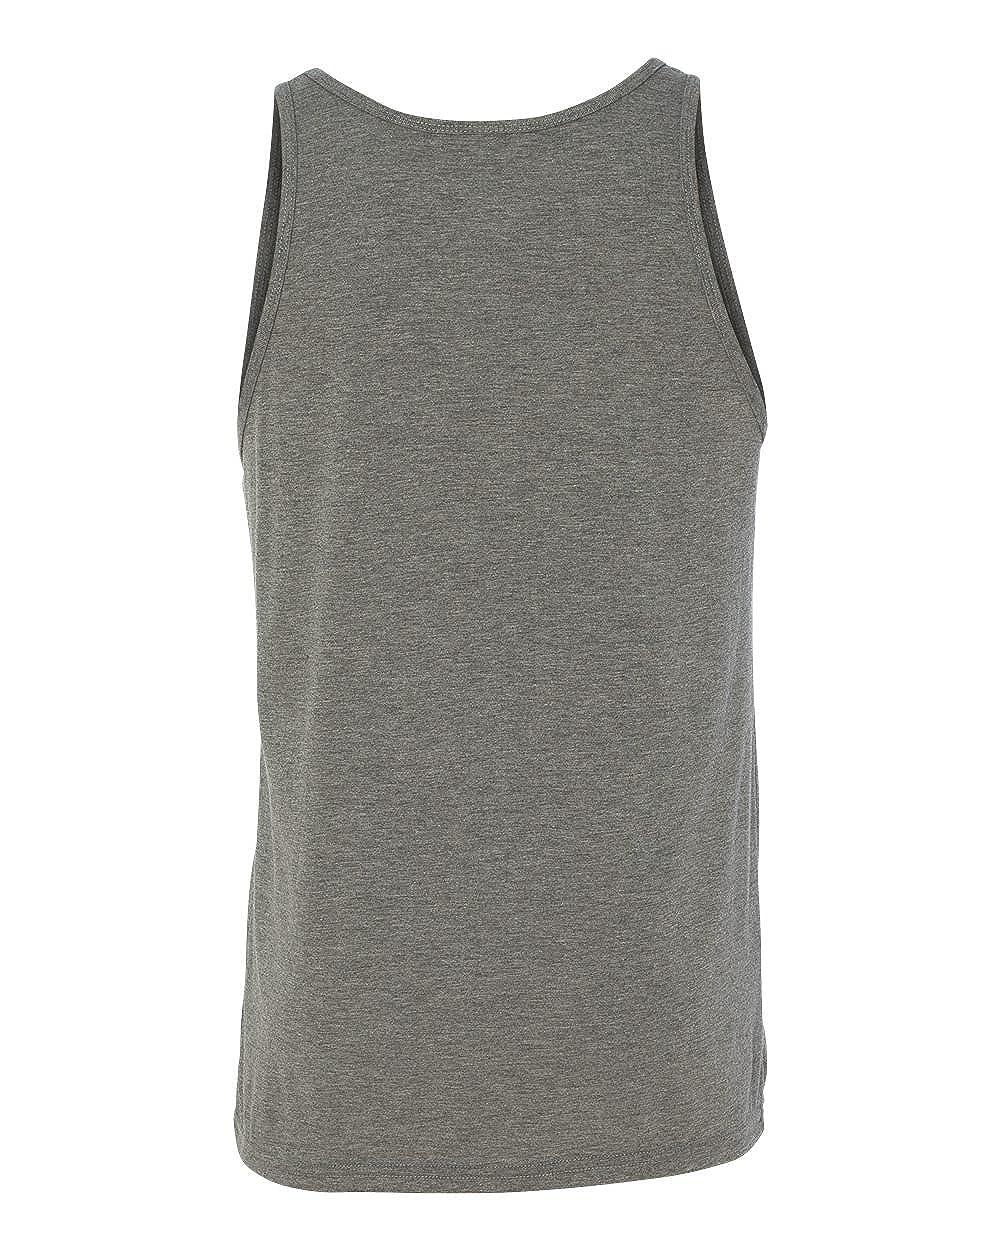 Large Grey Triblend Canvas Bella Comfort Scoop-Neck Jersey Tank Top